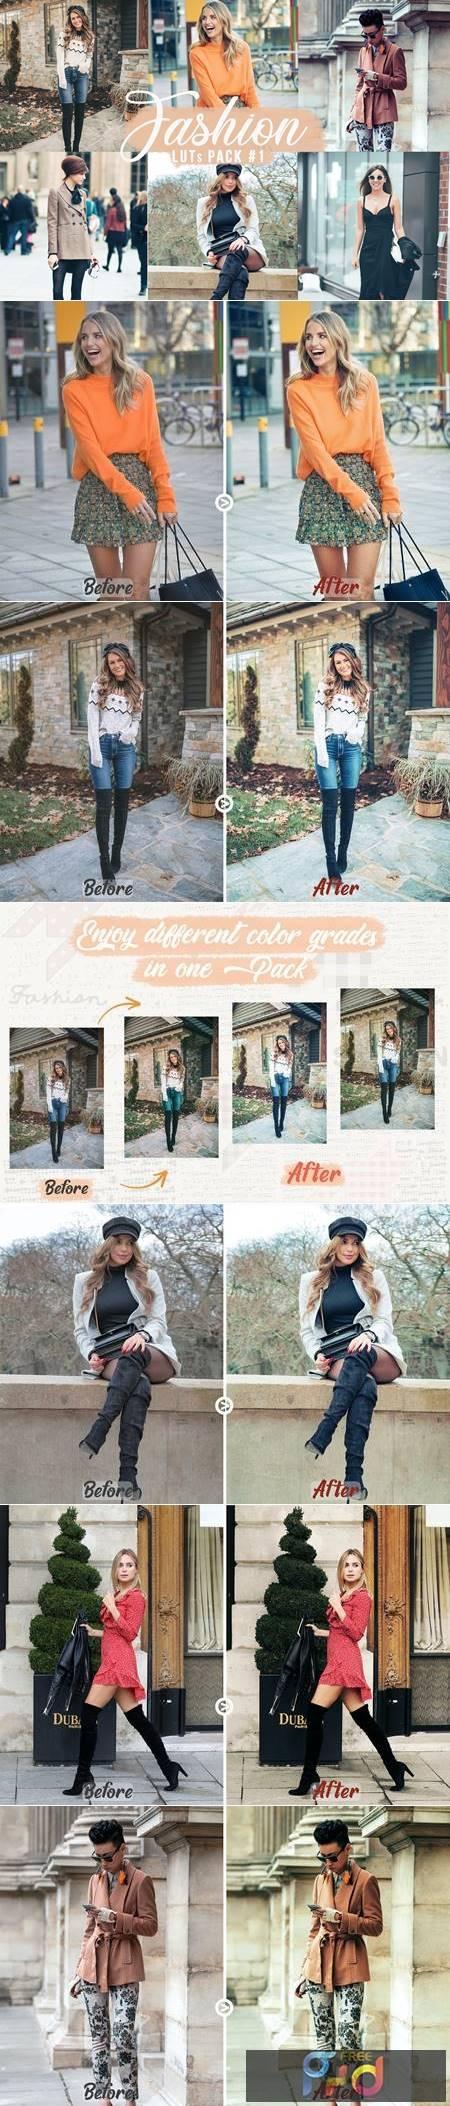 Fashion LUTs Pack #1 - Video Photo Color Grading V5DZMQB 1